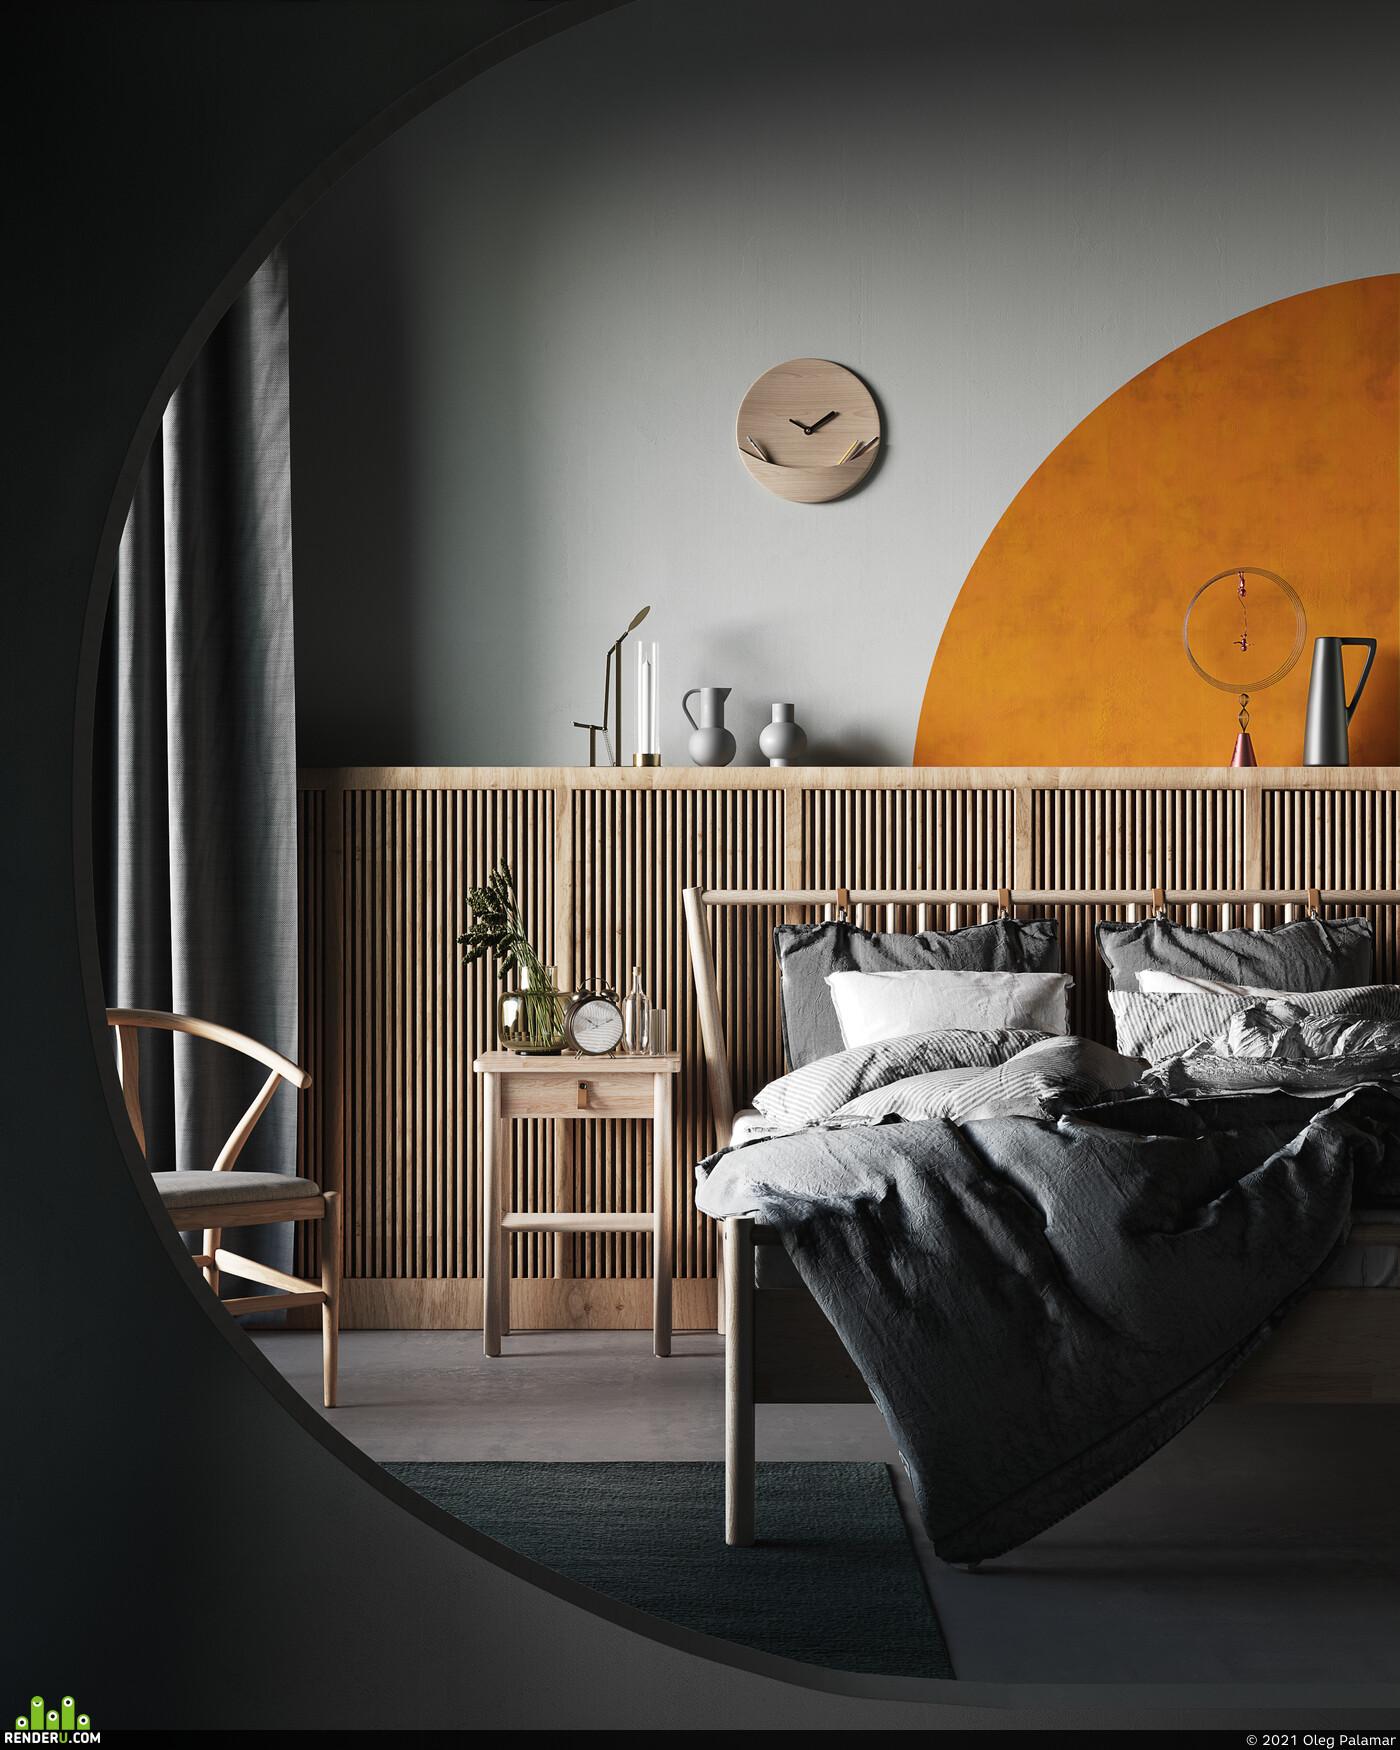 architecture, visualization, interior, interiordesign, archviz, CG